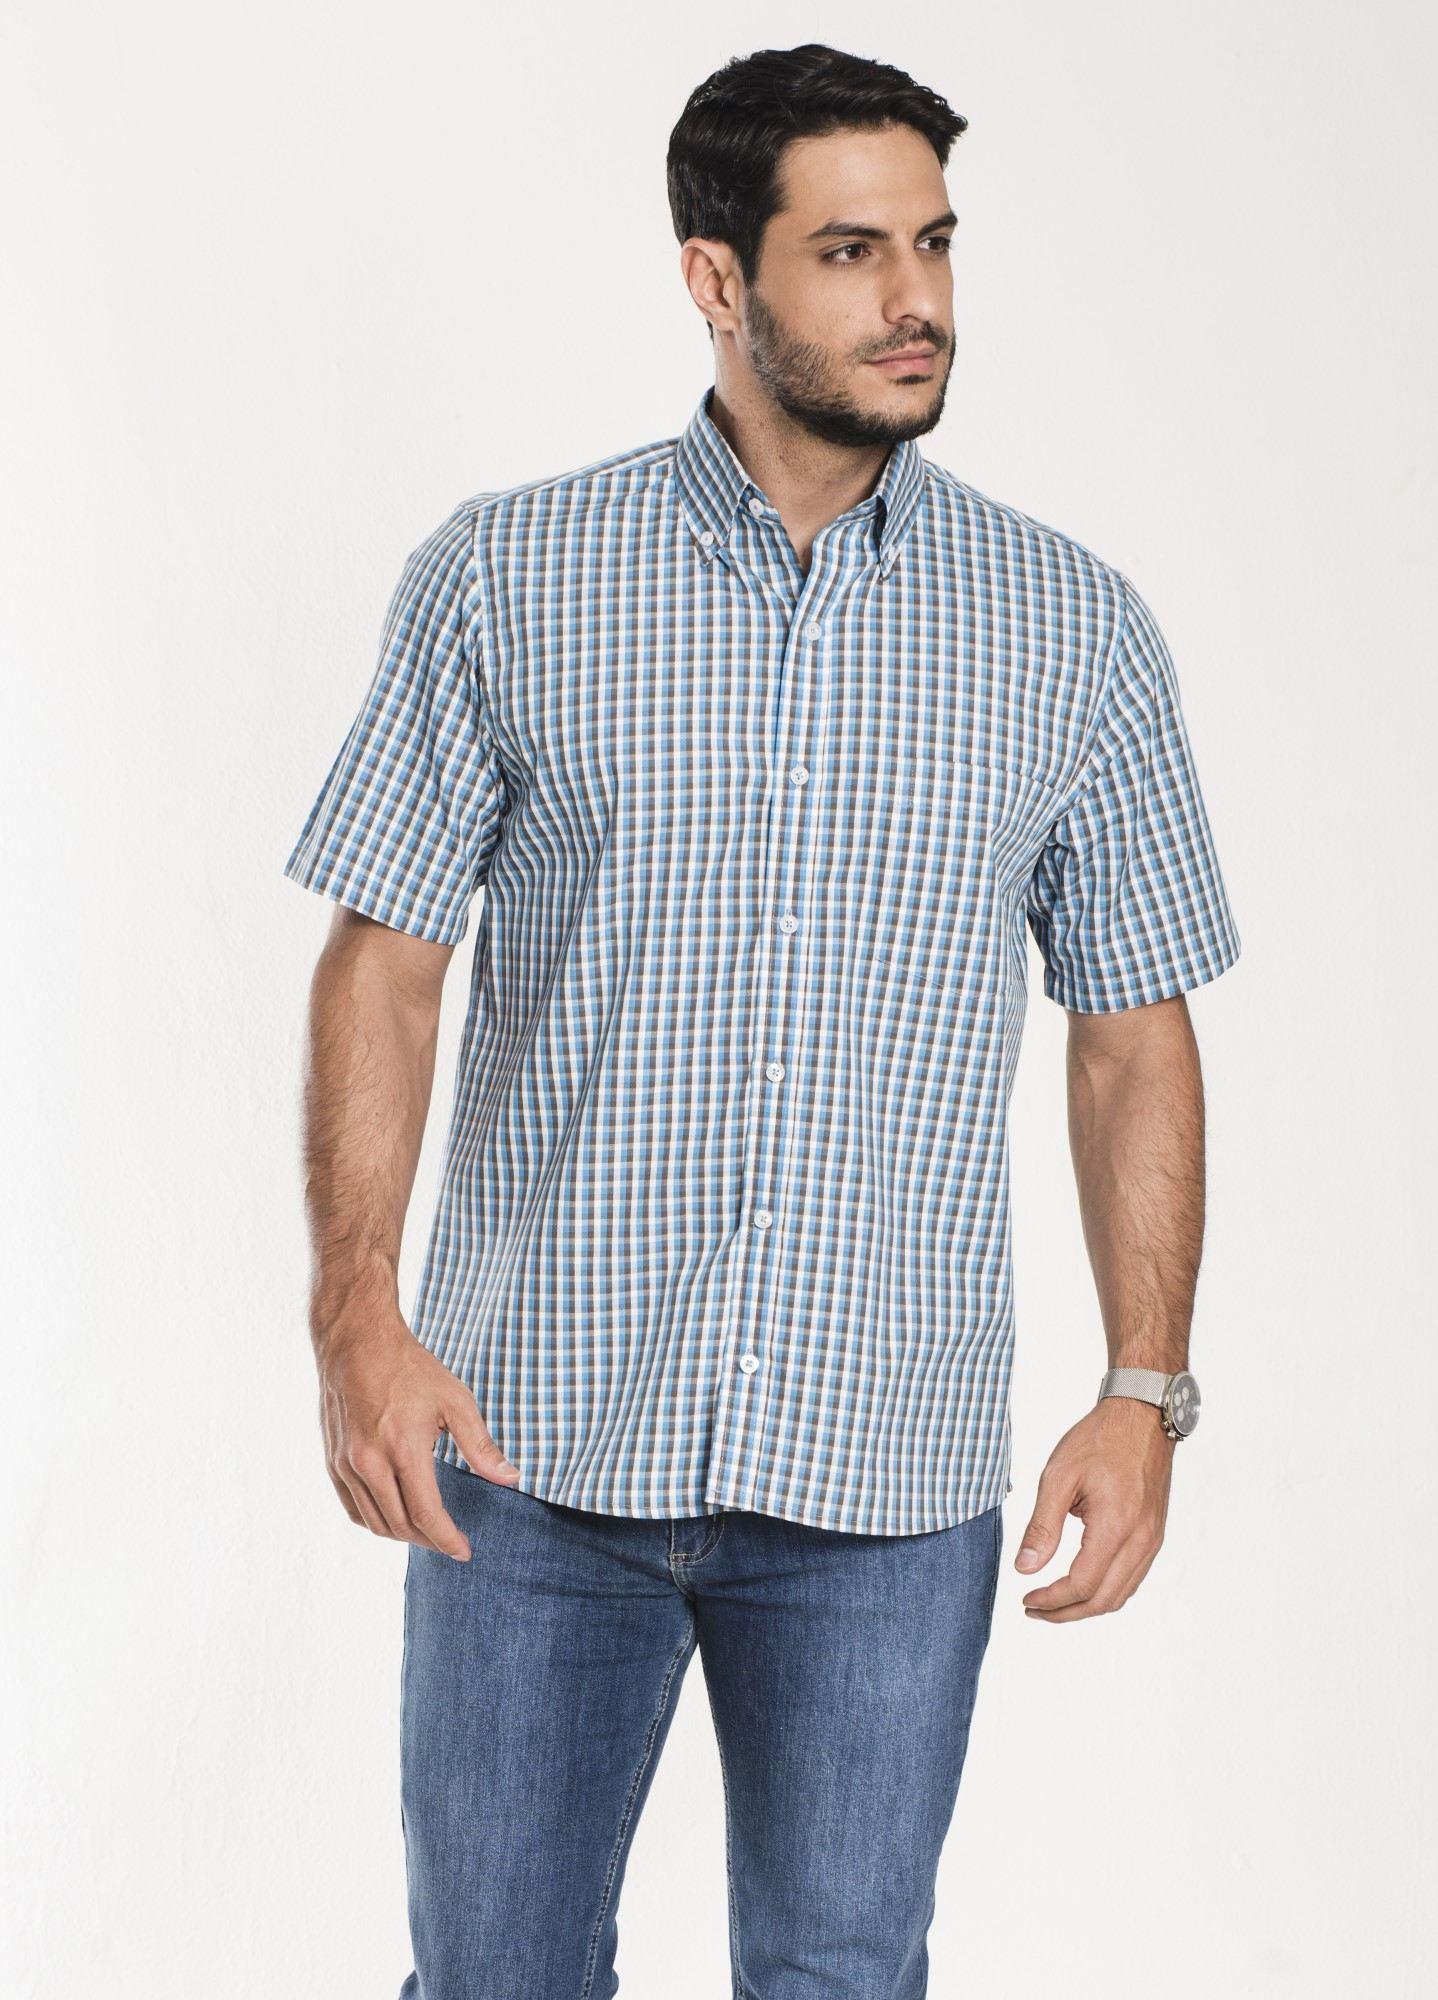 Camisa Xadrez Manga Curta Azul e Branca 2